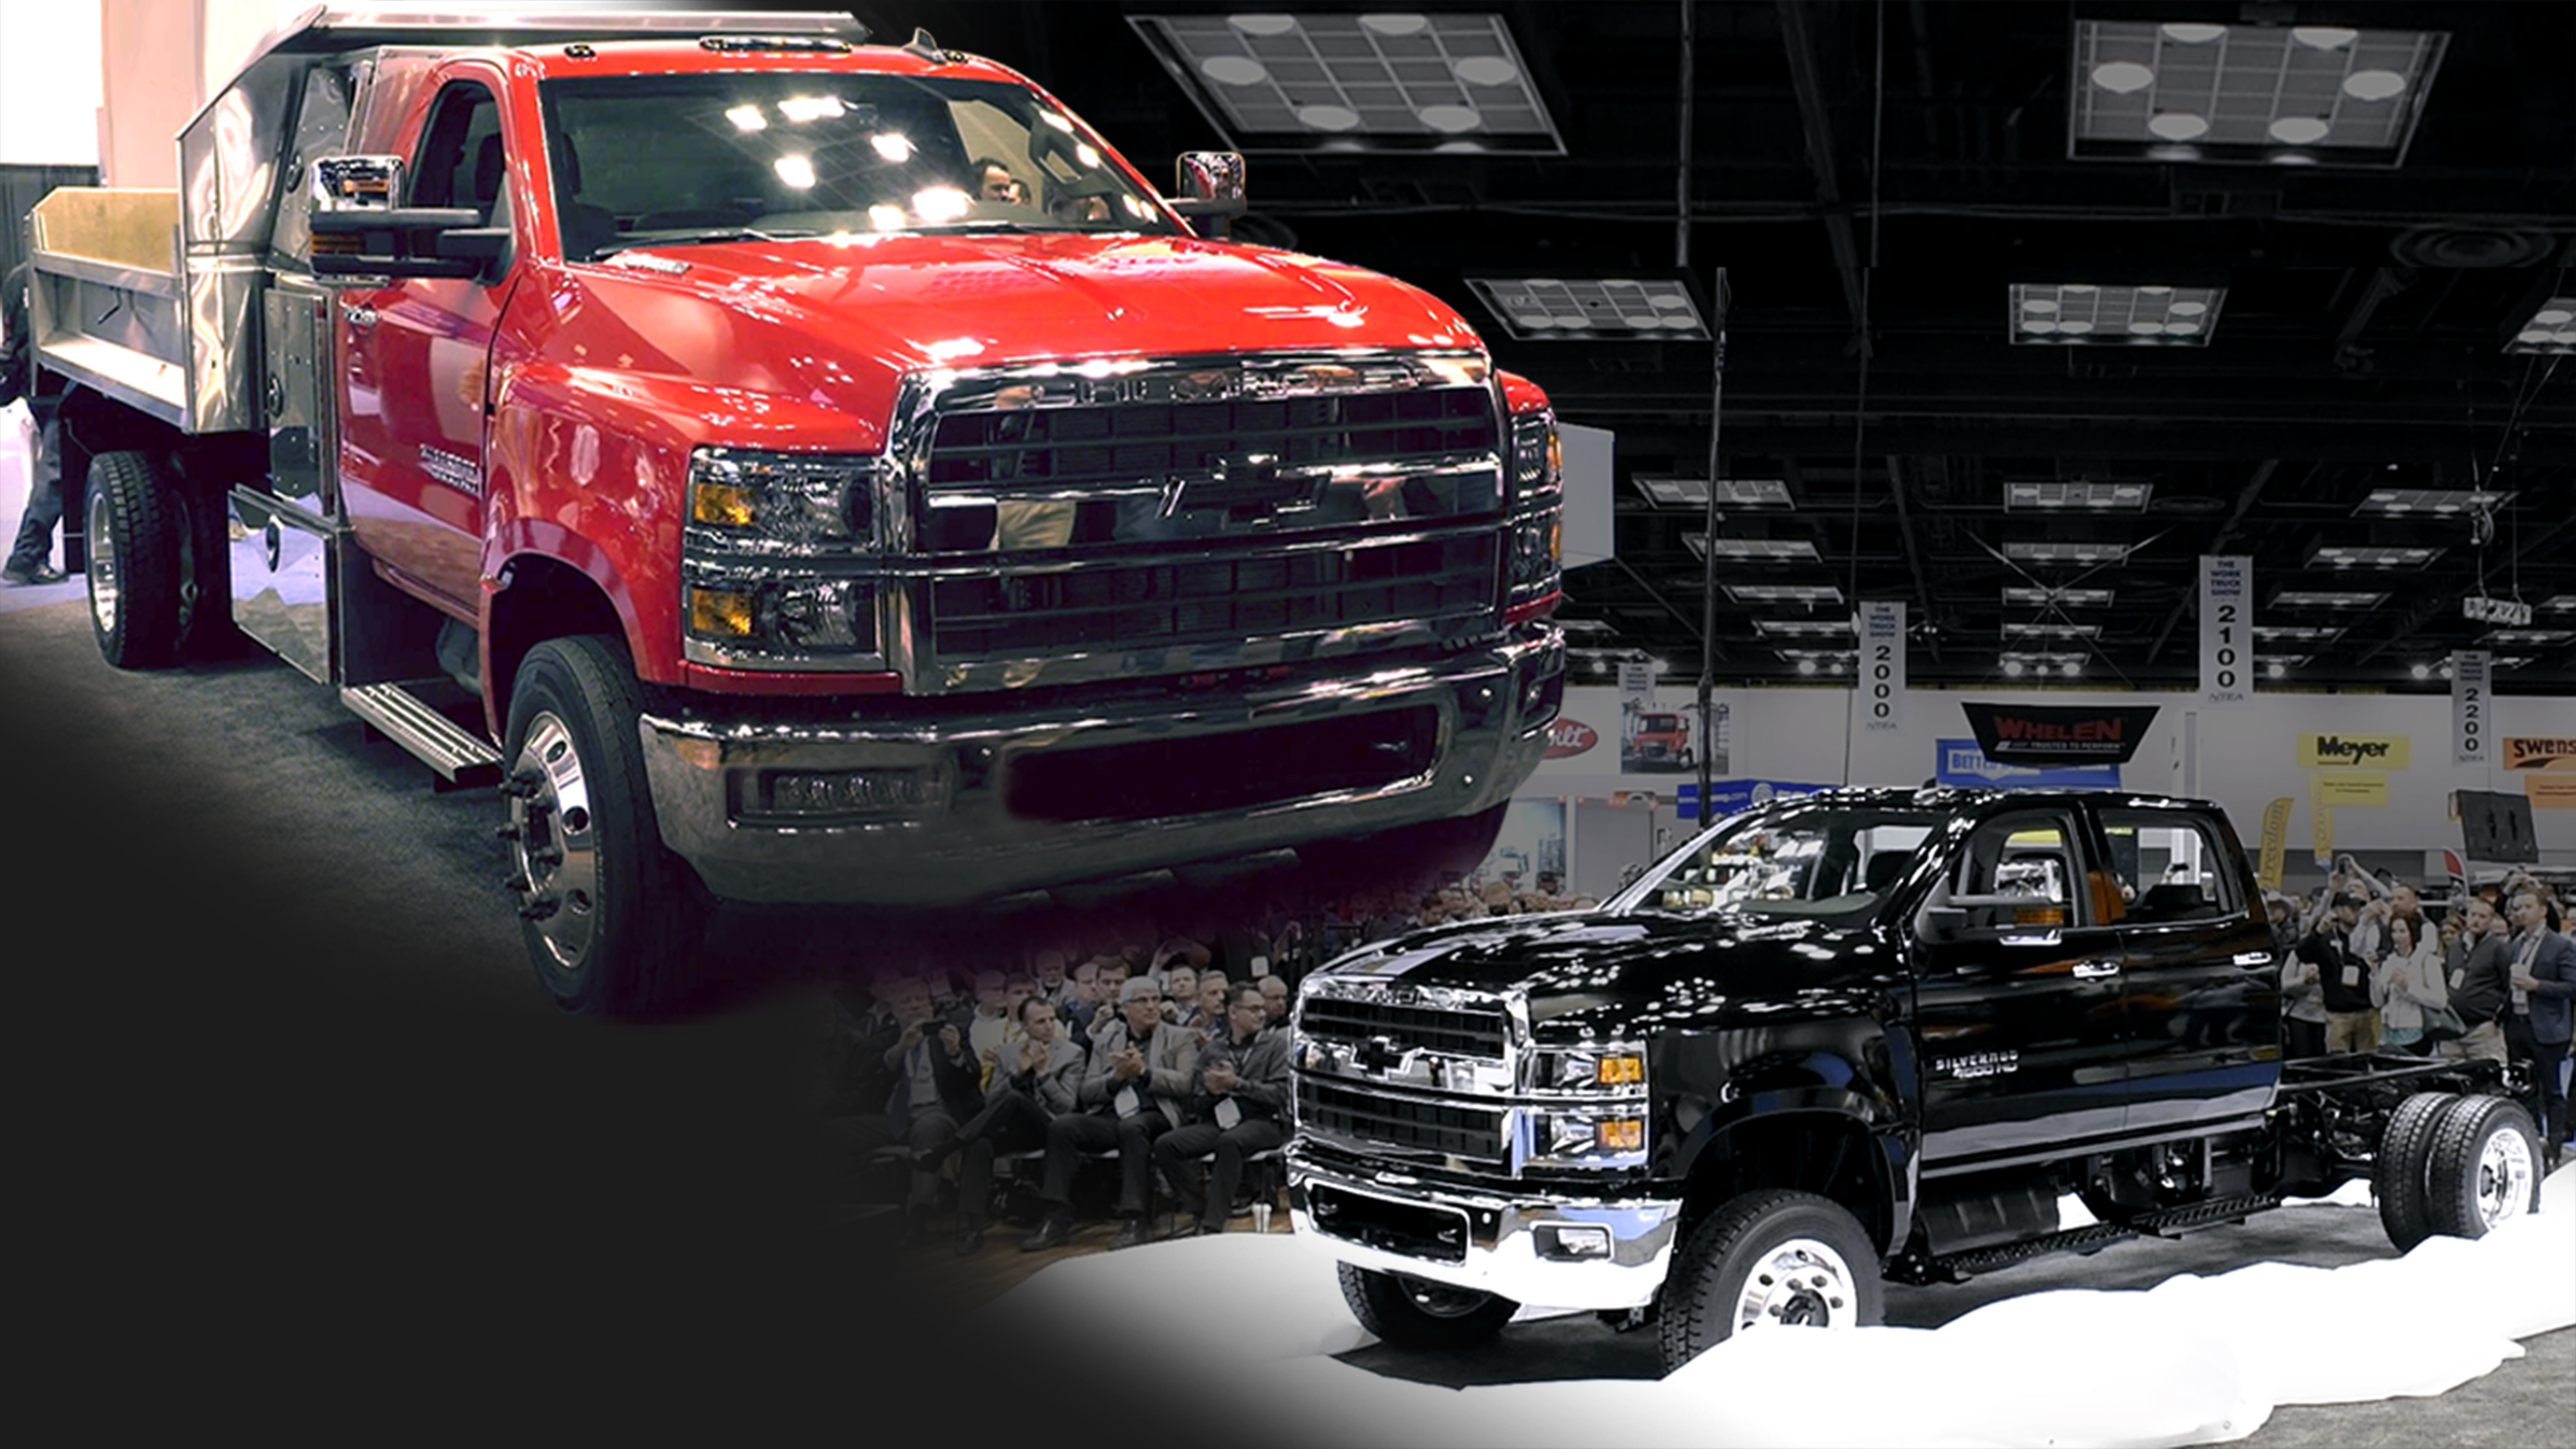 2019 Chevrolet Silverado 4500HD/6500HD Walkaround - Vehicle Research - Automotive Fleet